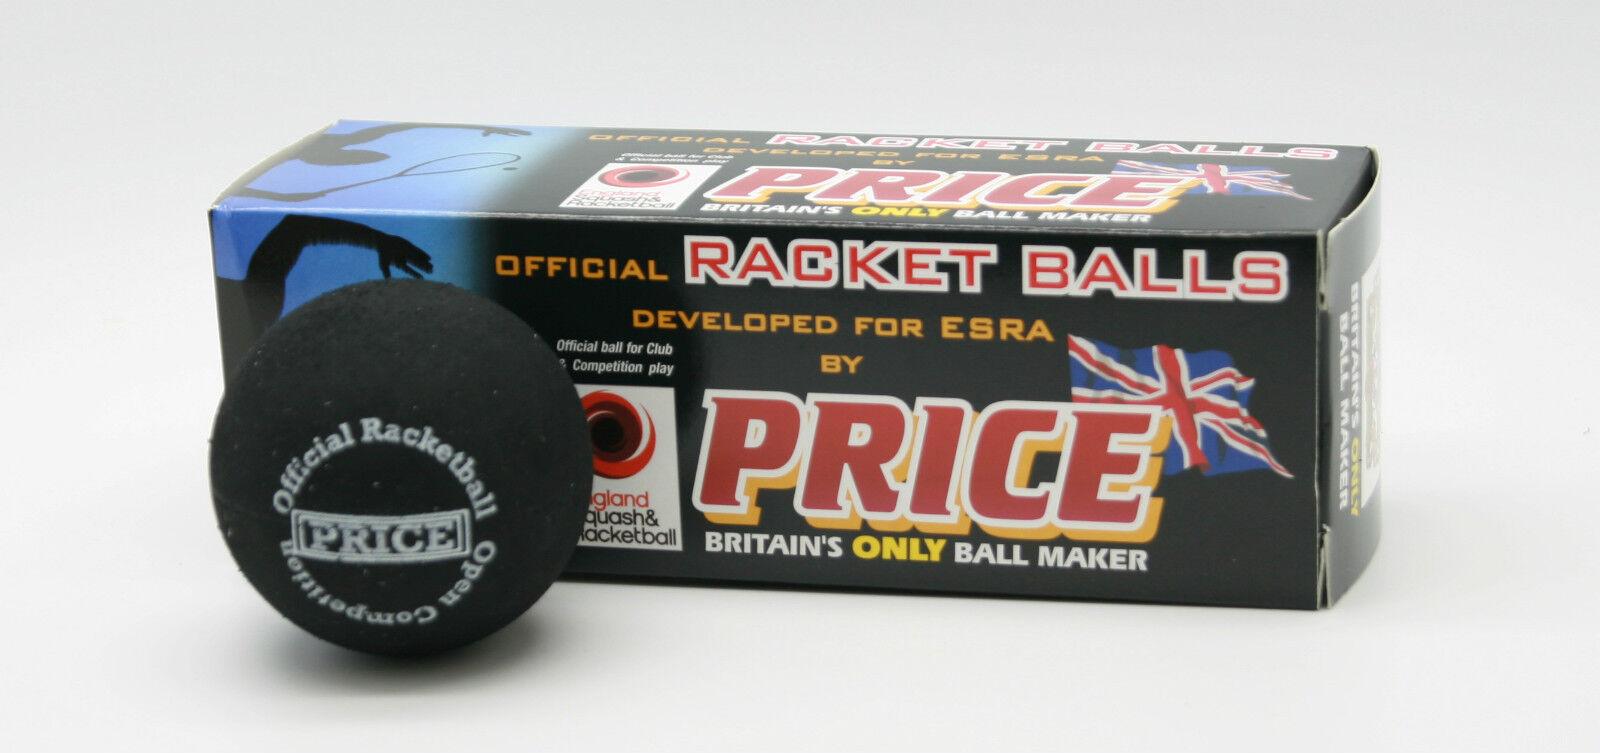 Price's Single Dot Match Racket Ball